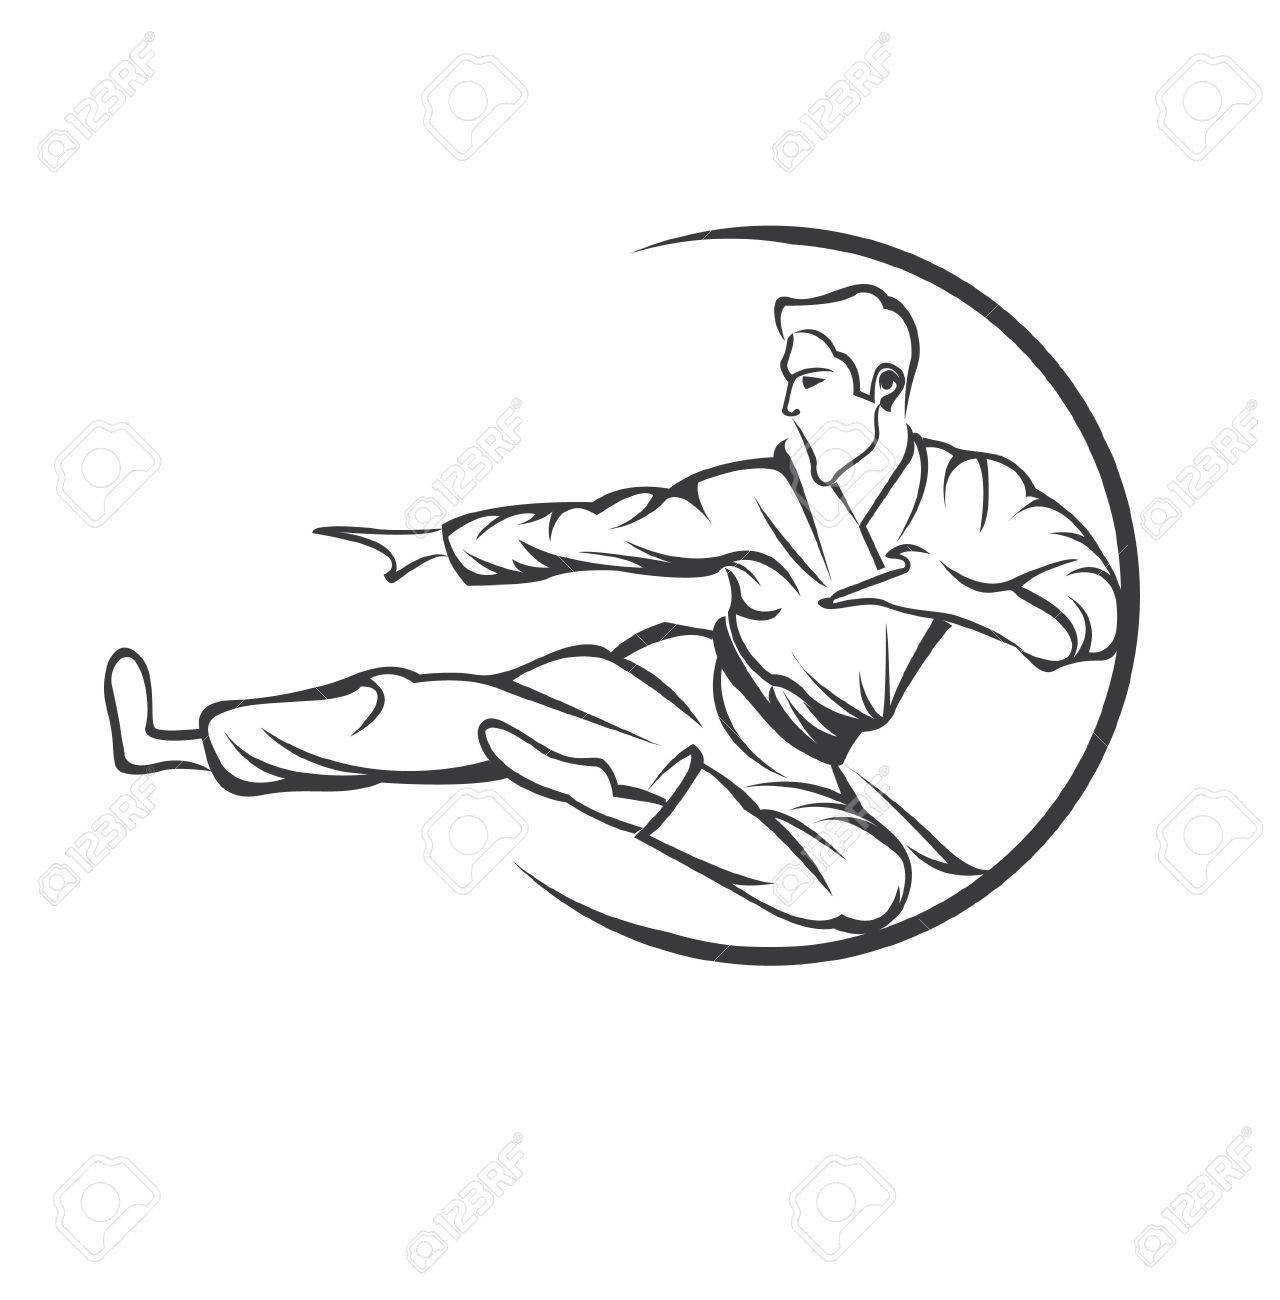 1280x1300 Martial Art Symbol Royalty Free Cliparts, Vectors, And Stock